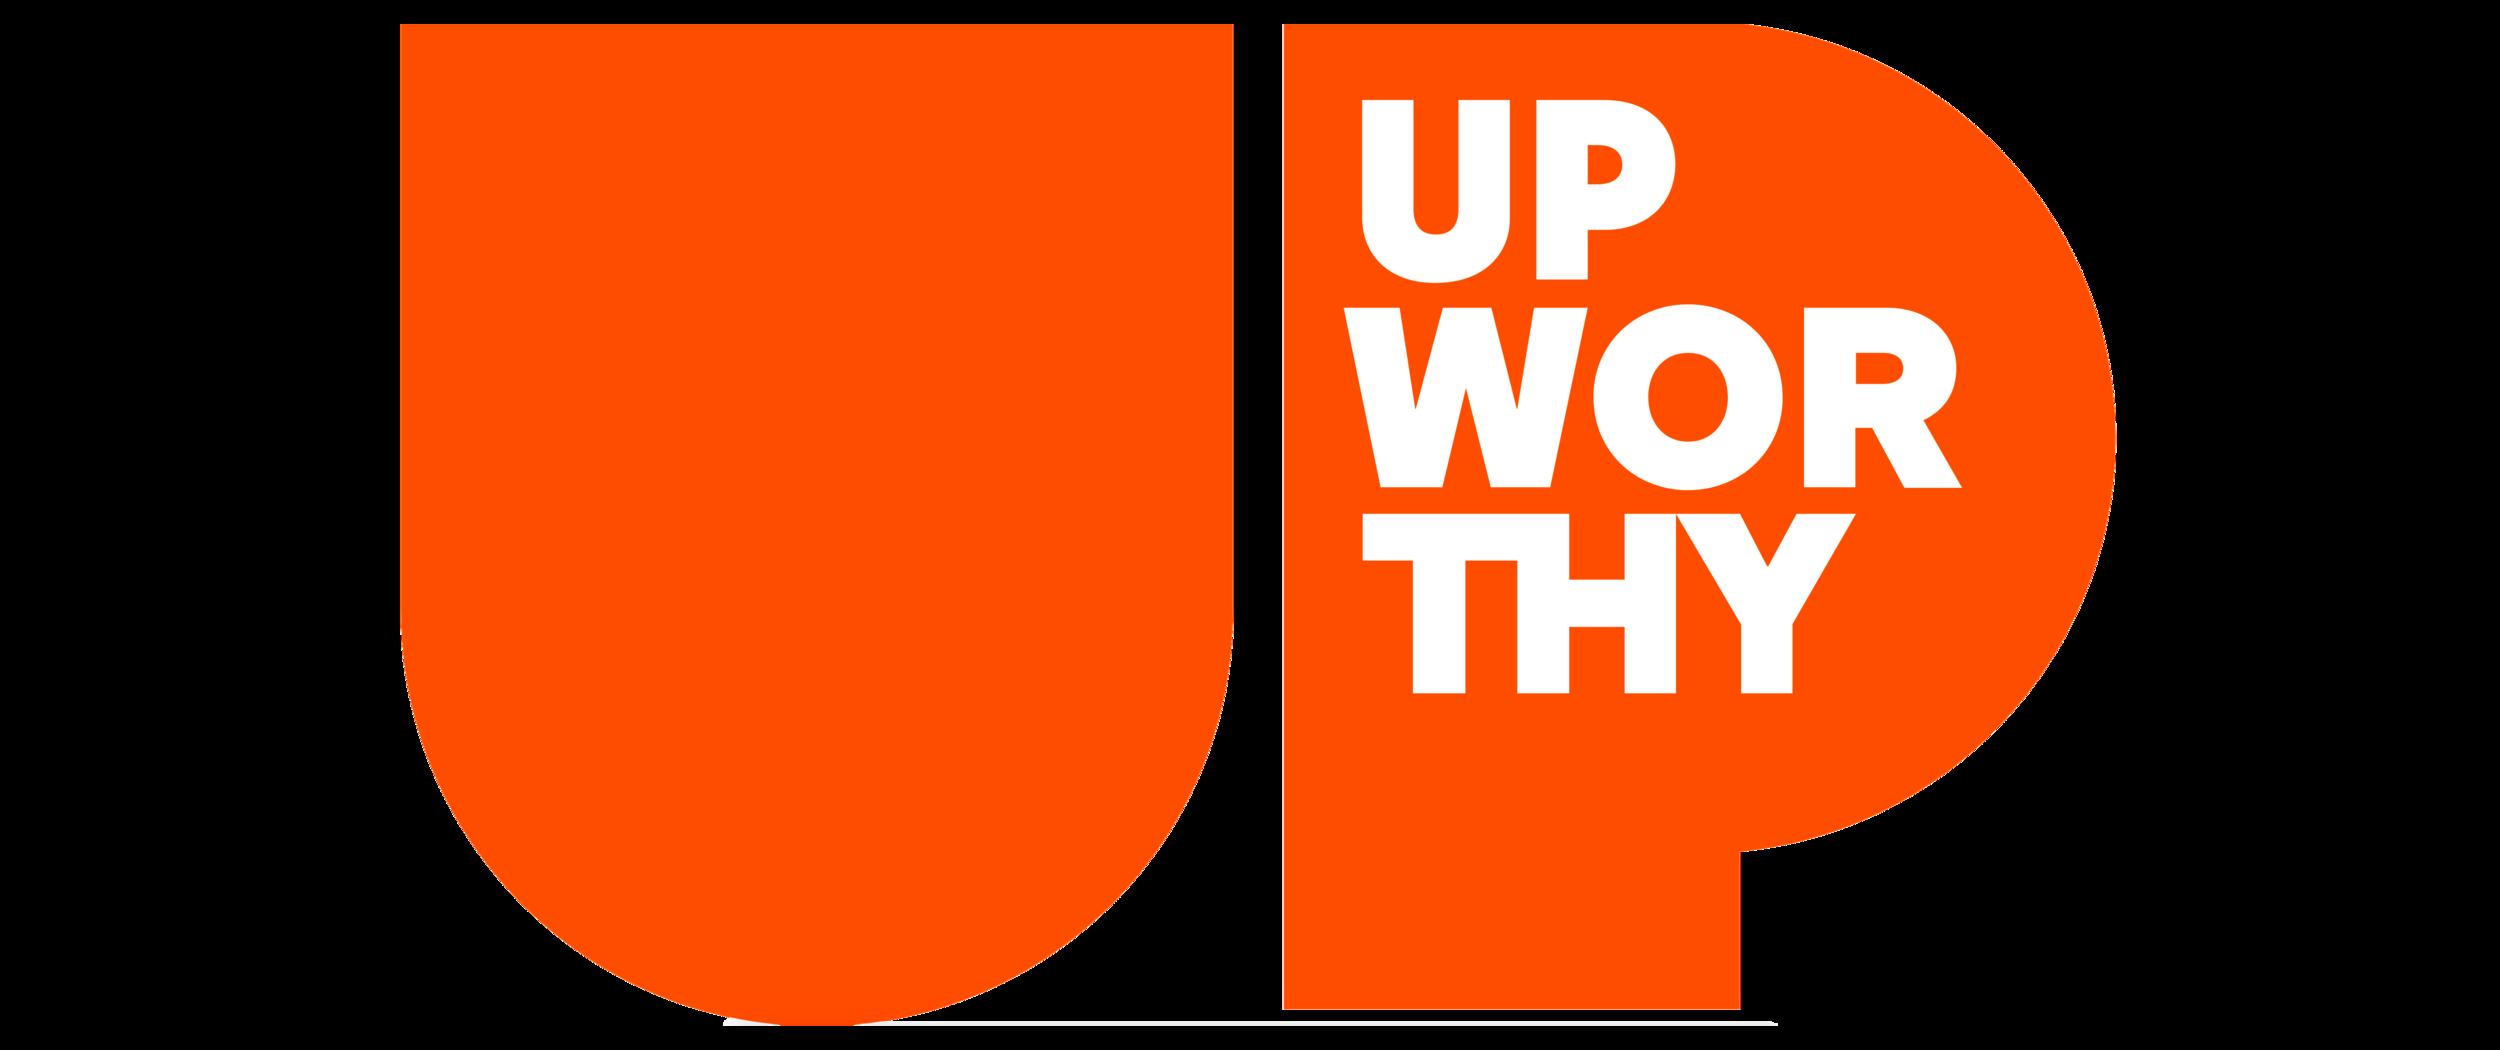 Copy of UpWorthy